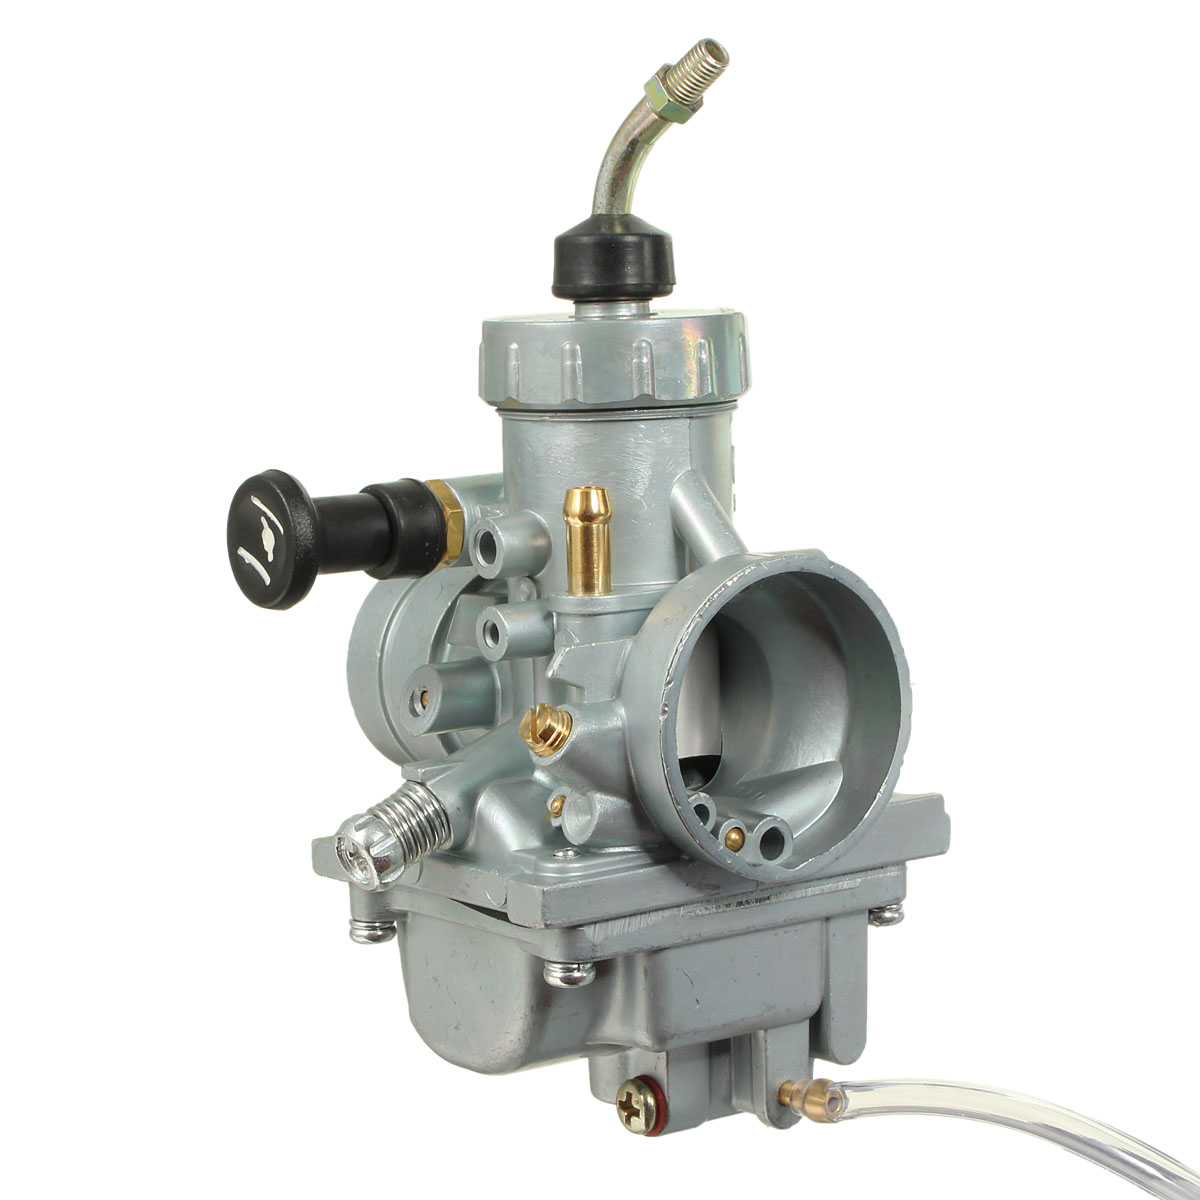 mikuni carb diagram 1988 rm 125 aliexpress com buy new 28mm 40mm carburetor    carb    for  aliexpress com buy new 28mm 40mm carburetor    carb    for